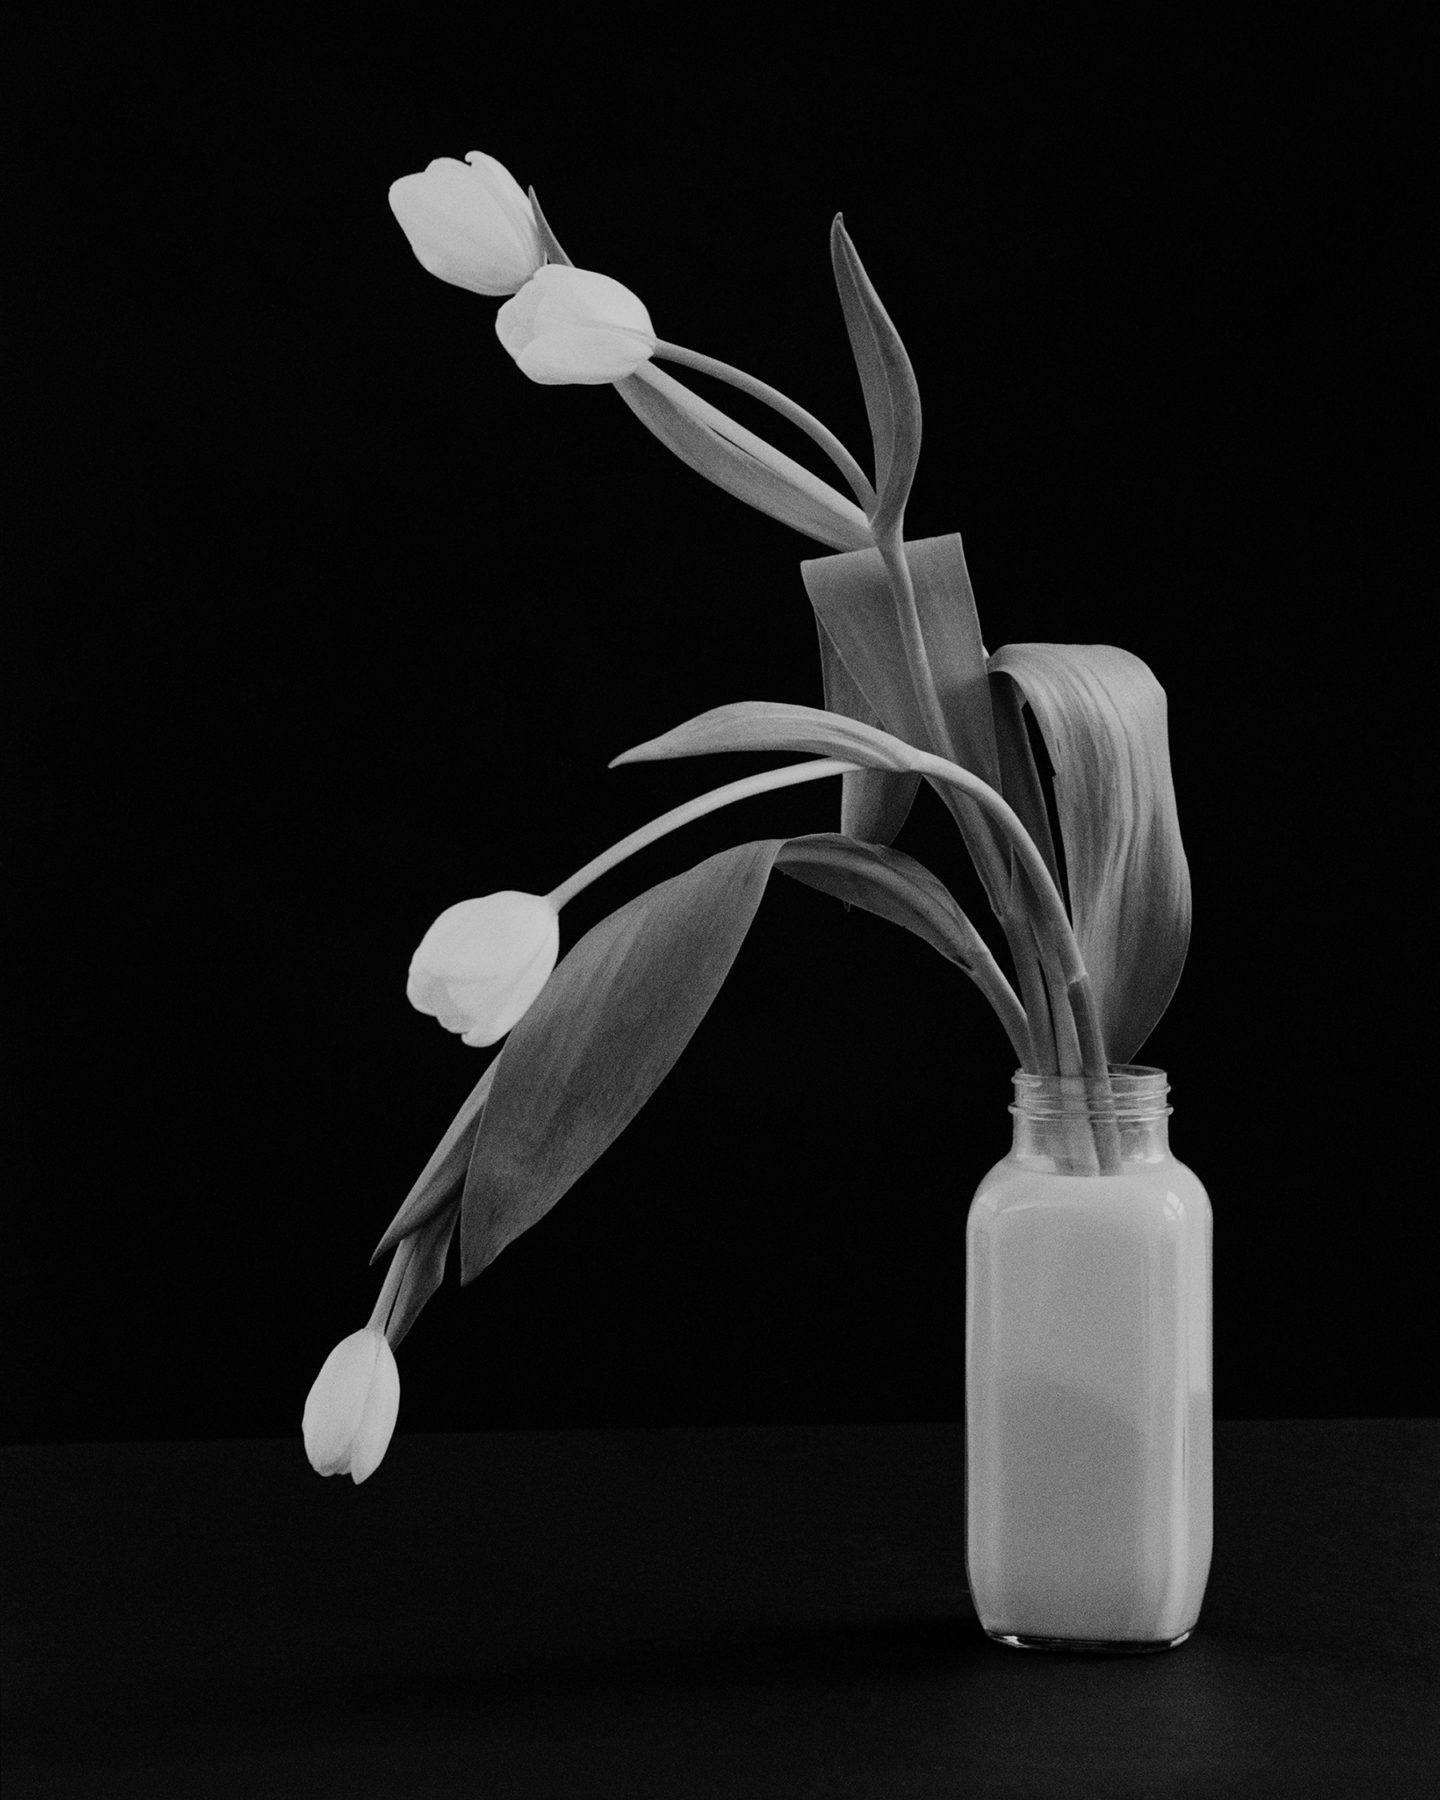 IGNANT-Photography-Brian-Kanagaki-Golden-Persimmons-2-014